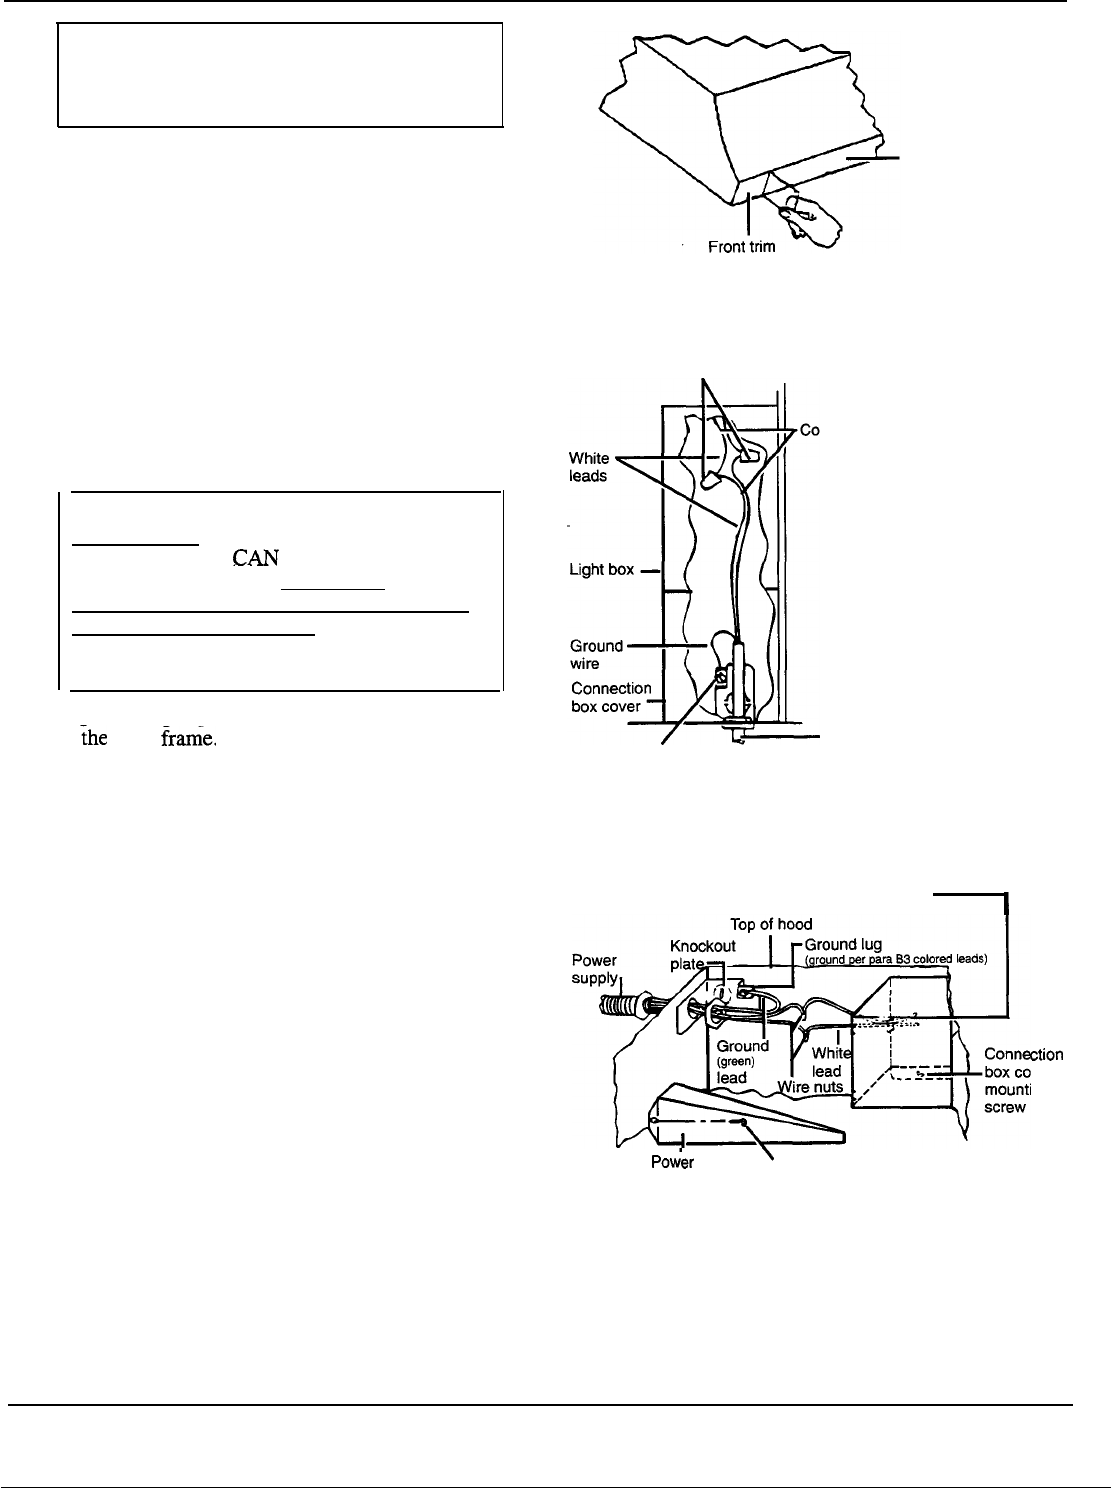 Wiring Diagram For Ge Range - Wiring Diagram Schemas